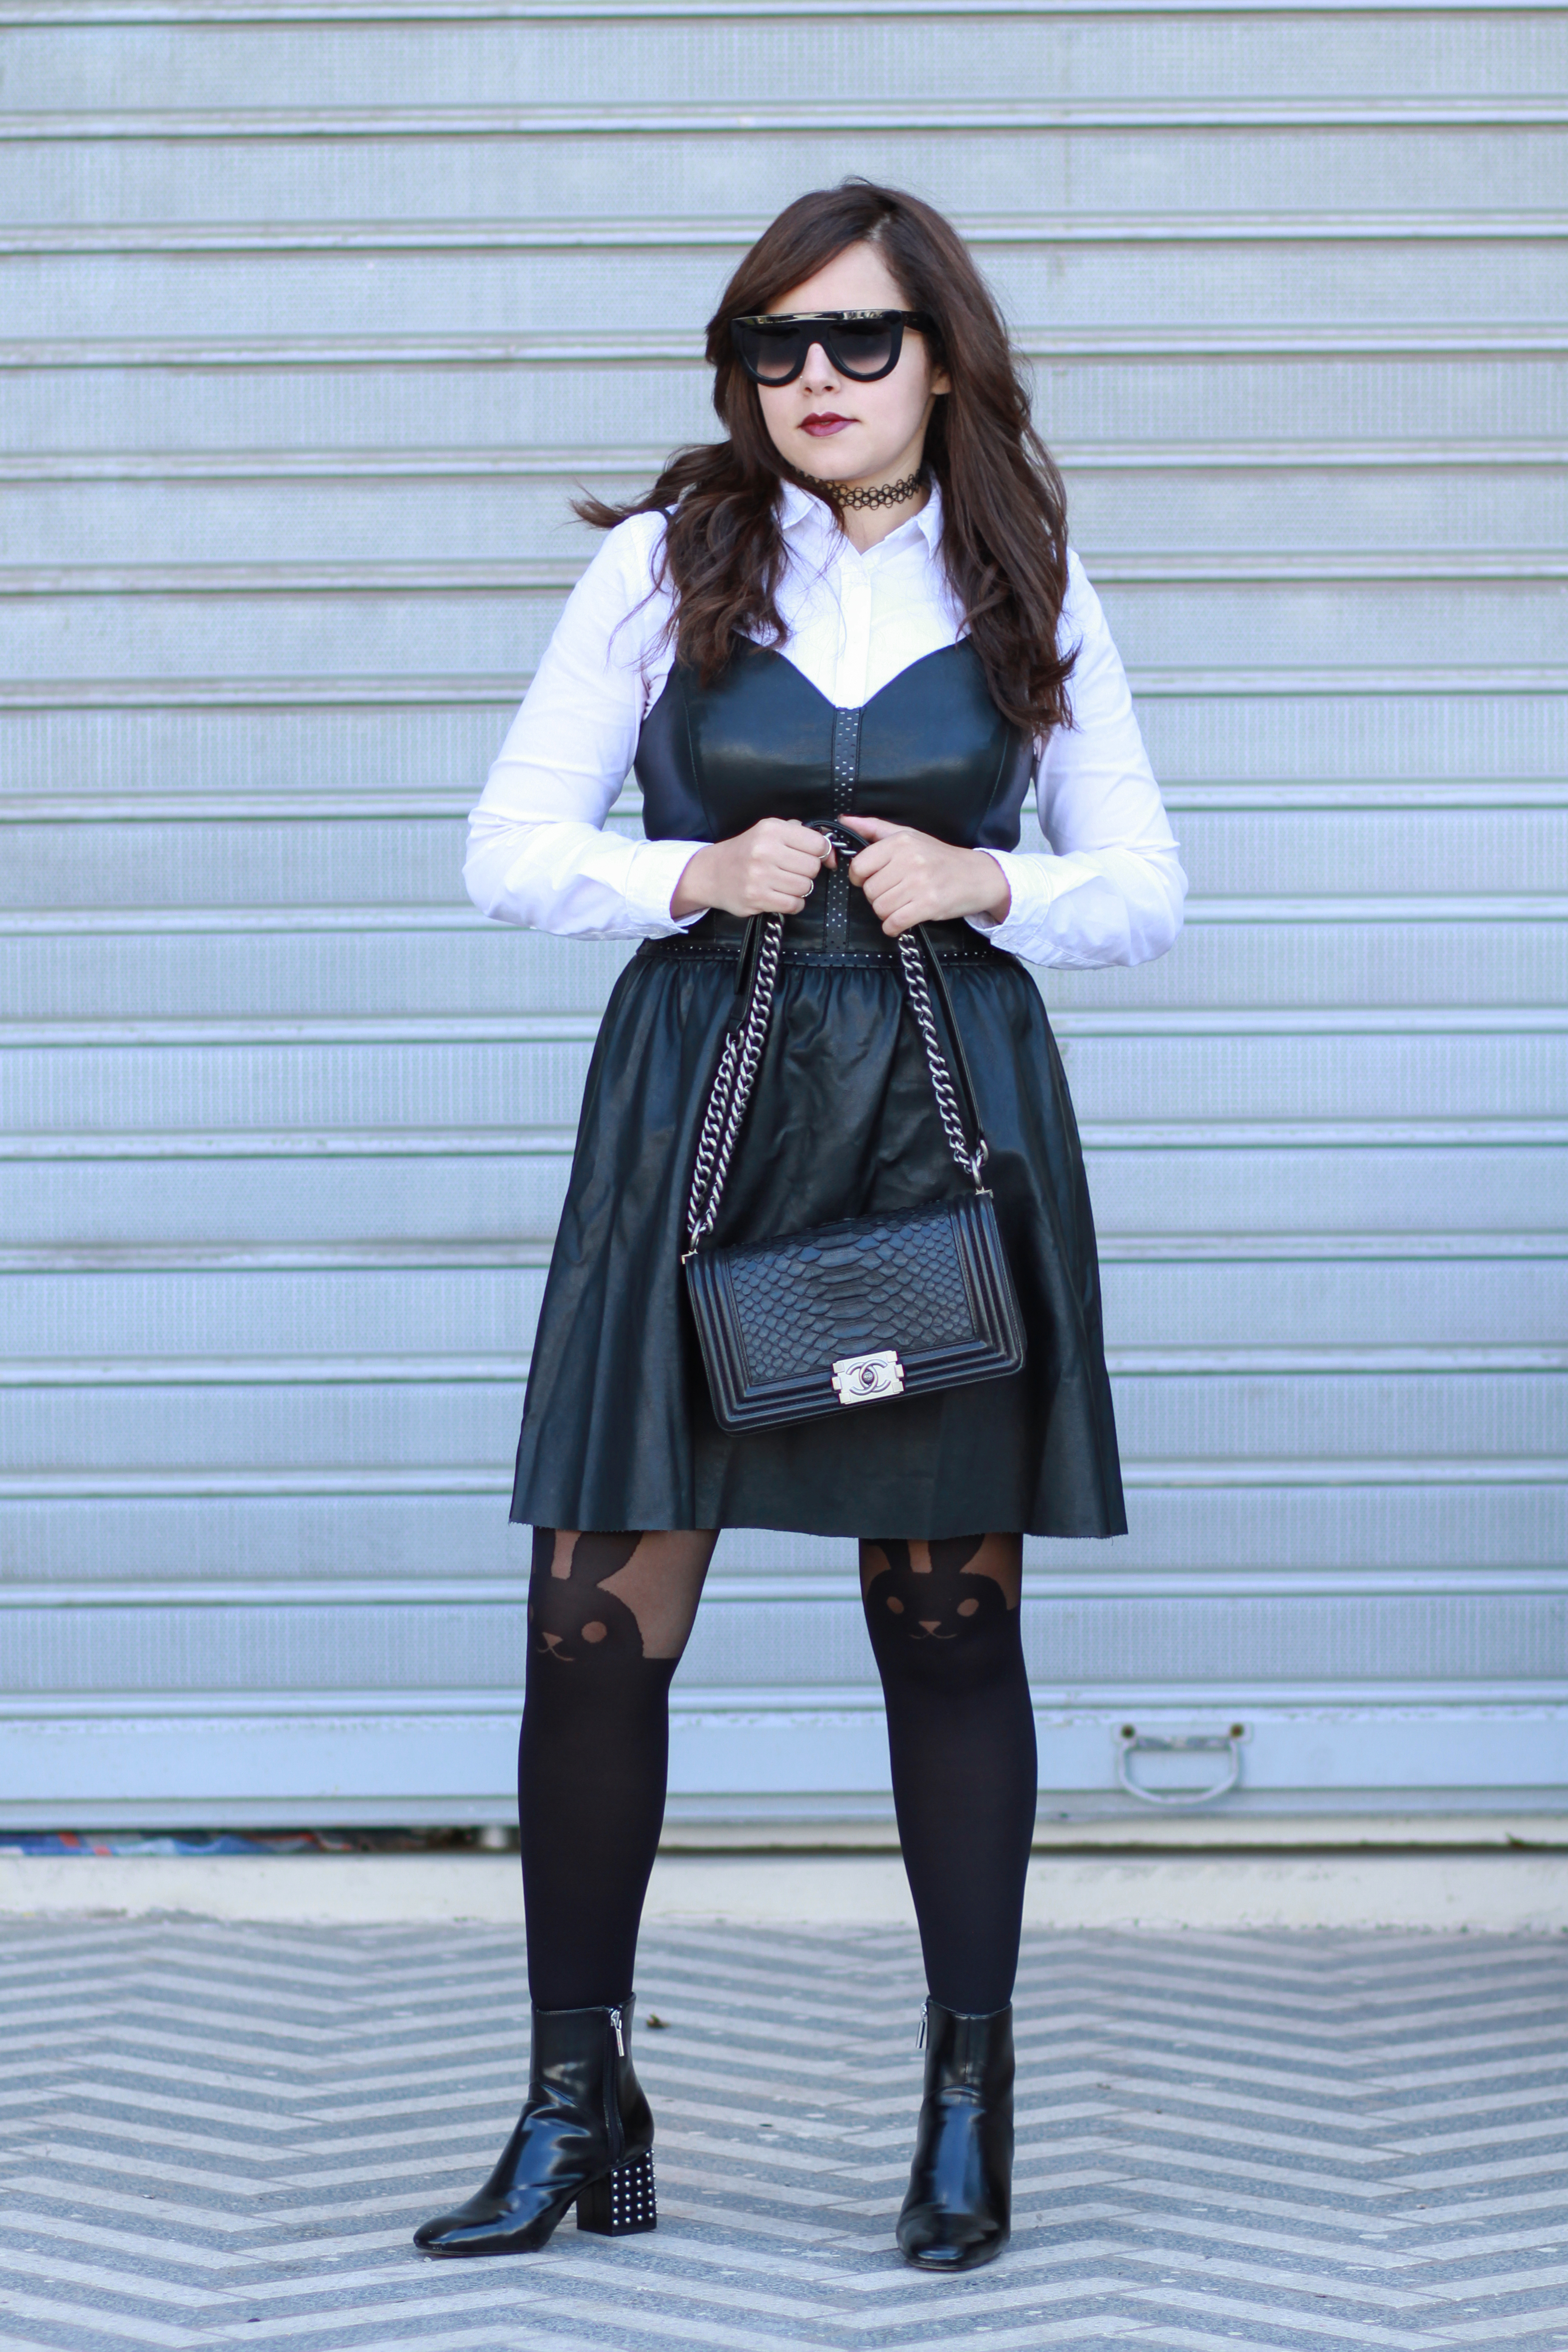 fake-leather-dress-blog-mode-chiccarpediem-2